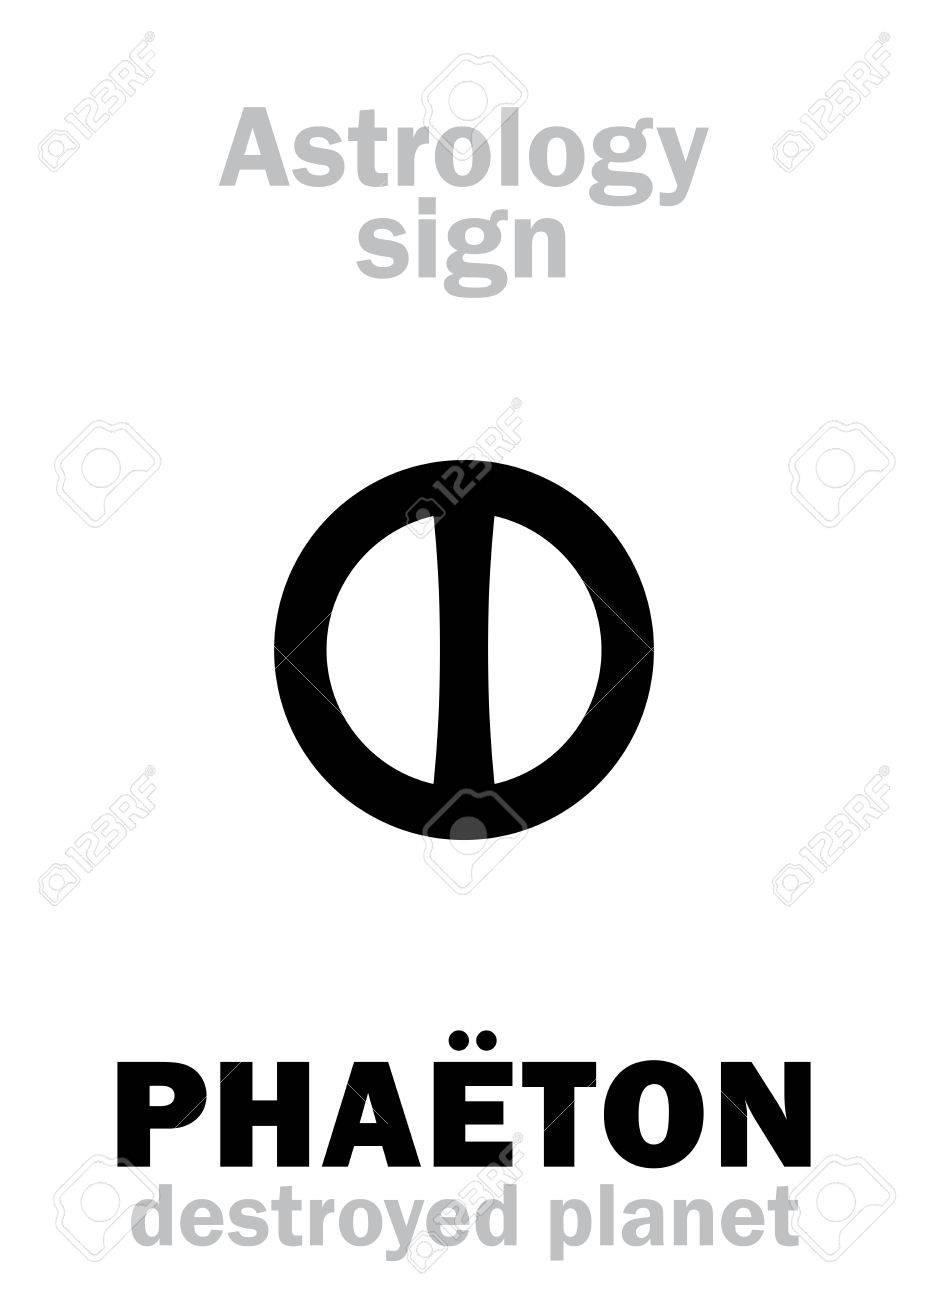 Astrology Alphabet Phaton Juno Hypothetic Destroyed Planet